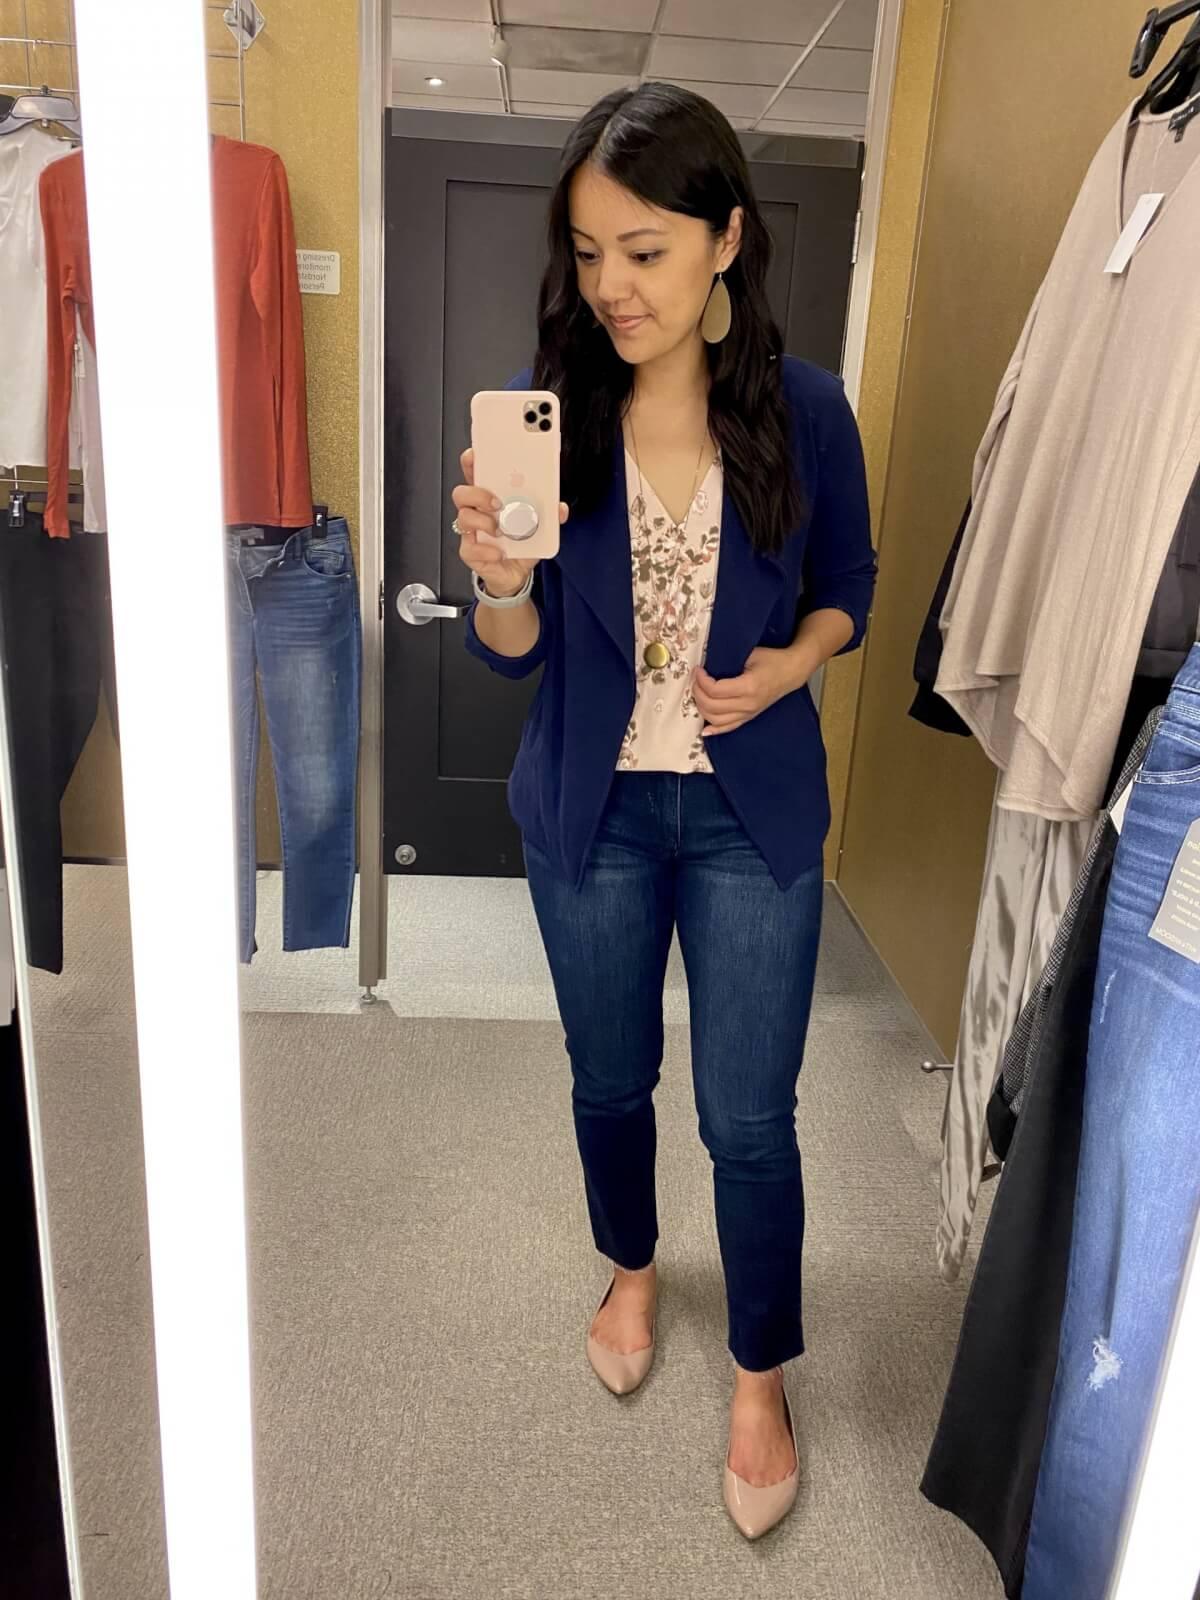 pink beige floral tank blouse + blue knit blazer + straight leg jeans + gold earrings + nude flats + gold pendant necklace